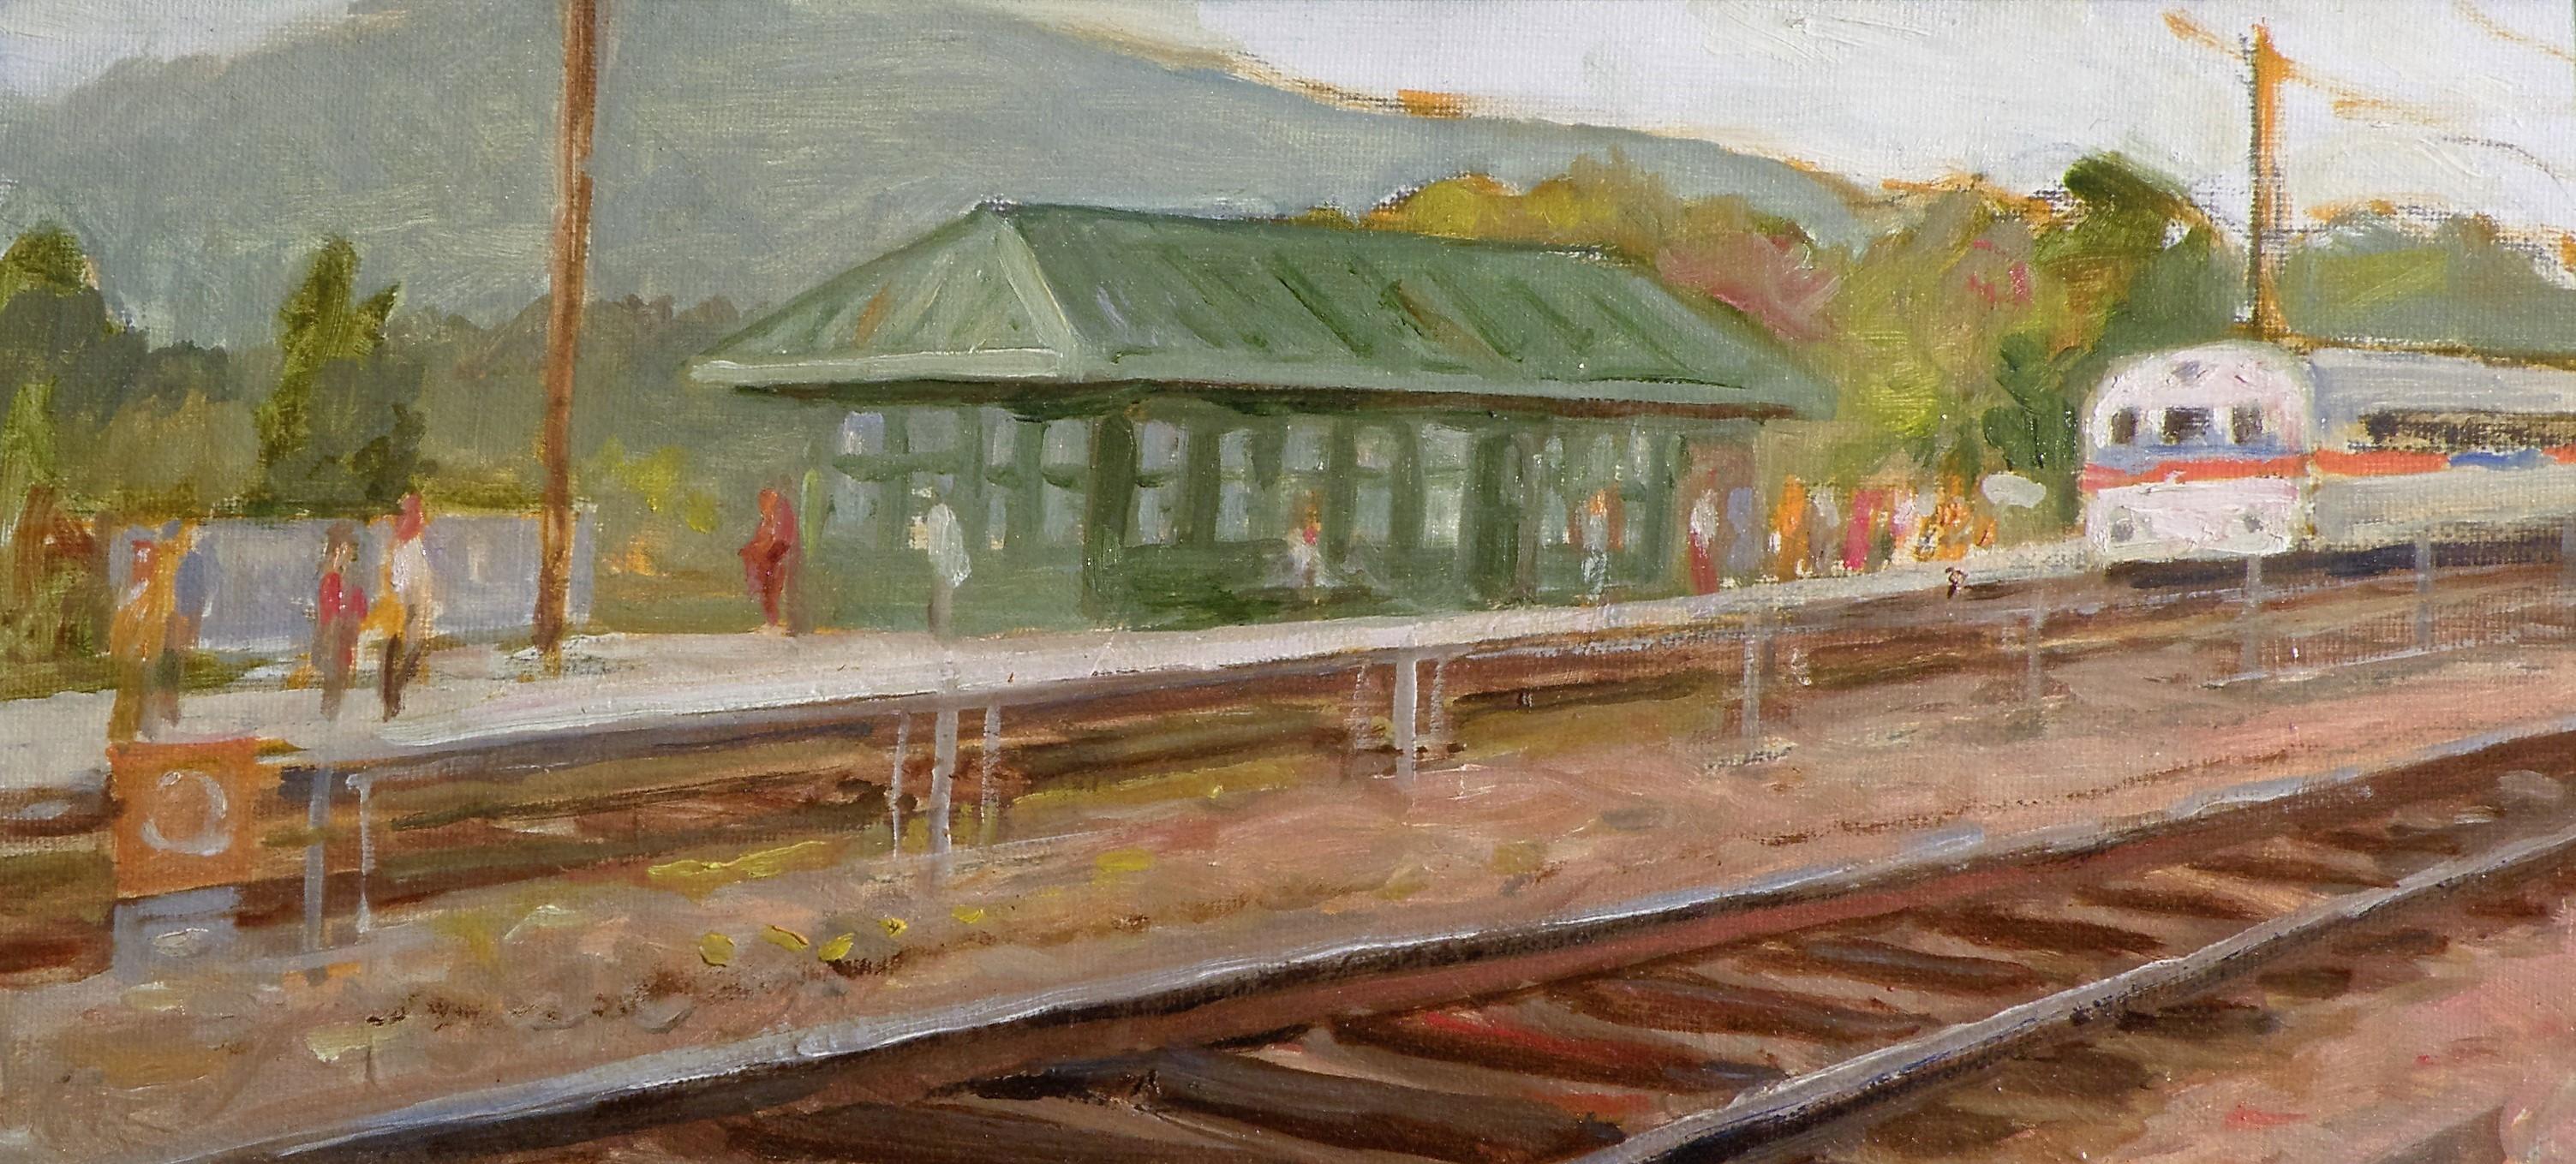 Downingtown Station